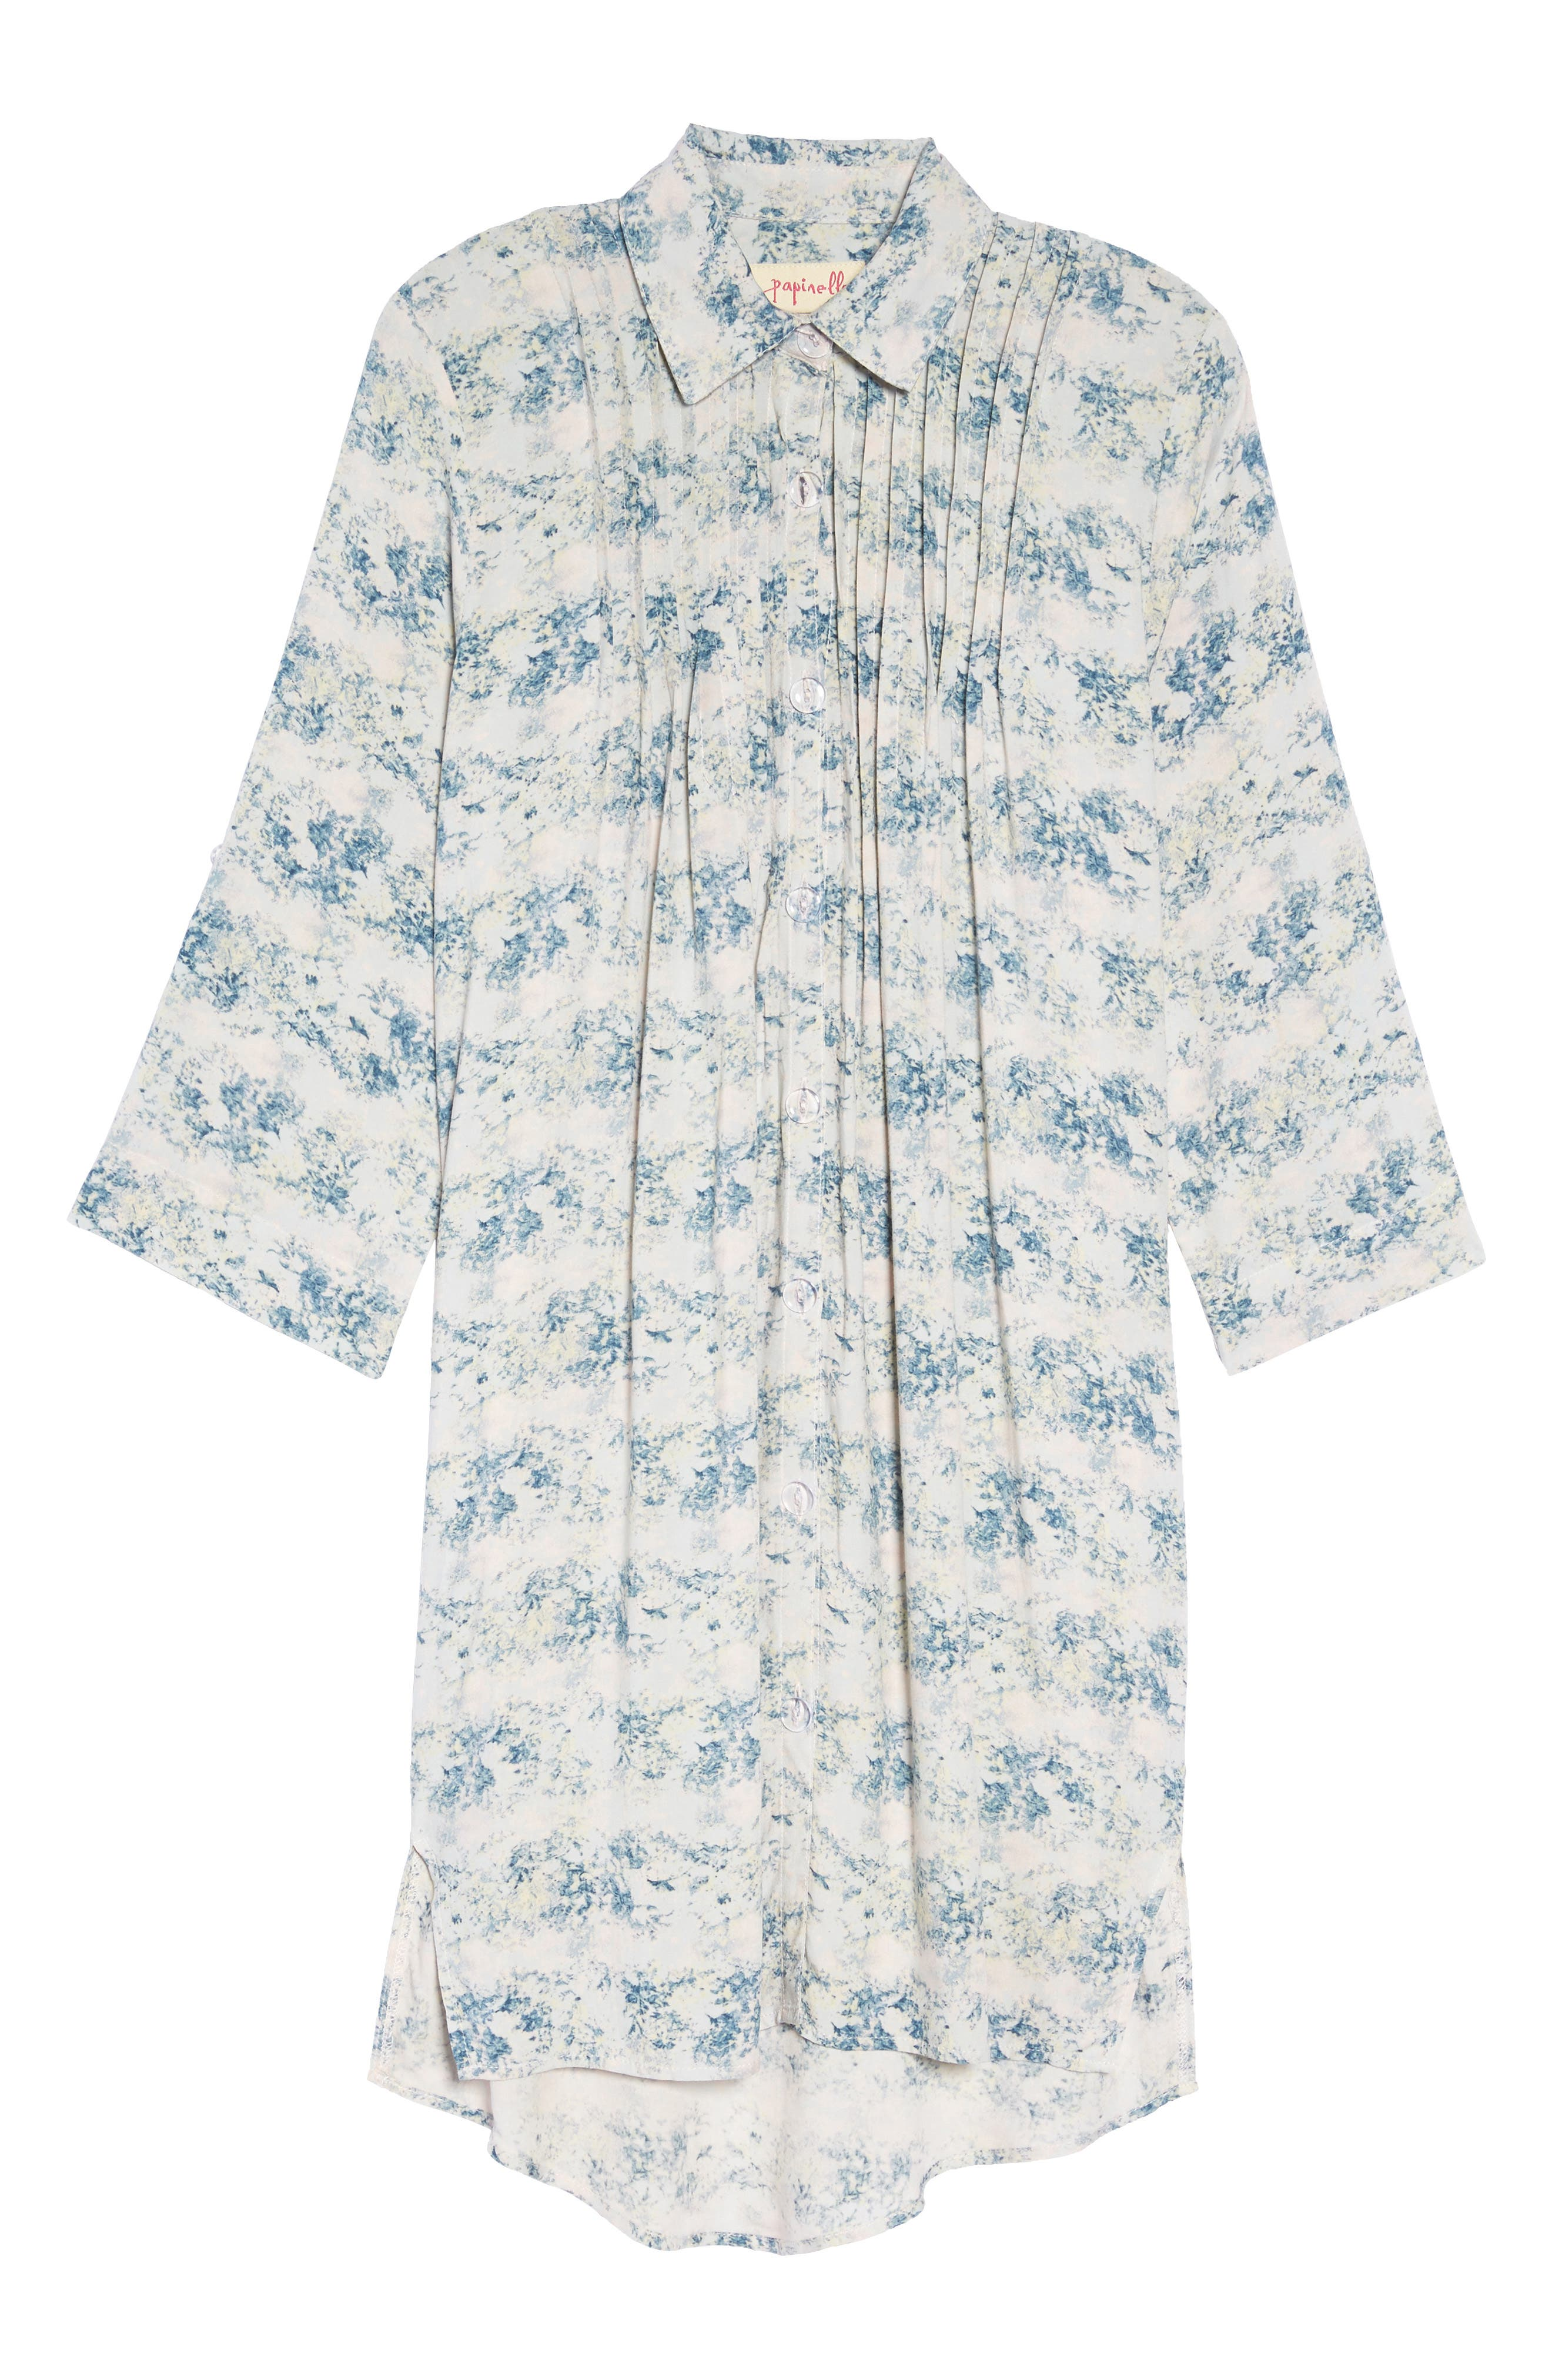 PAPINELLE,                             Floral Print Sleep Shirt,                             Alternate thumbnail 6, color,                             403